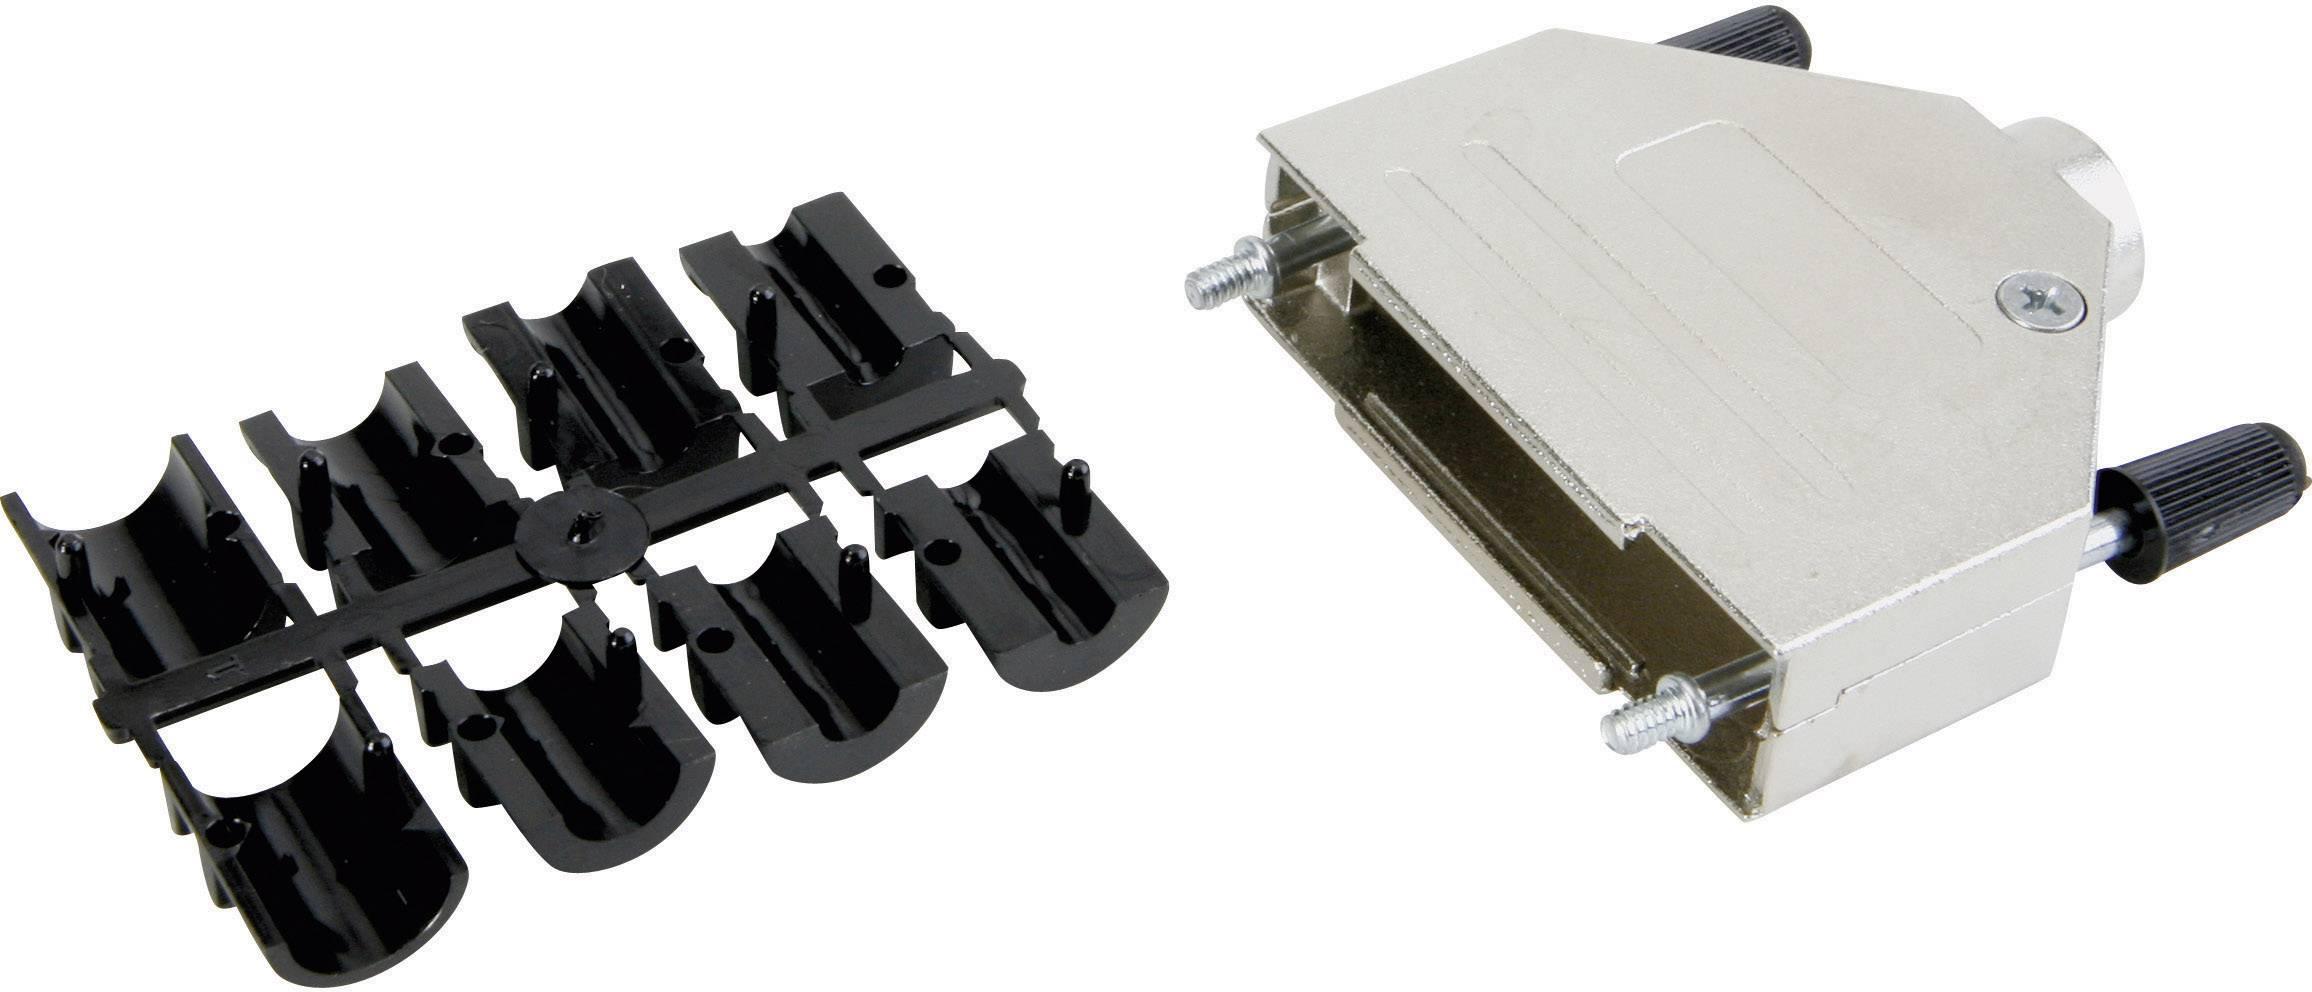 D-SUB pouzdro Conec 165X02689XE 165X02689XE, pólů 9, kov, 45 °, stříbrná, 1 ks